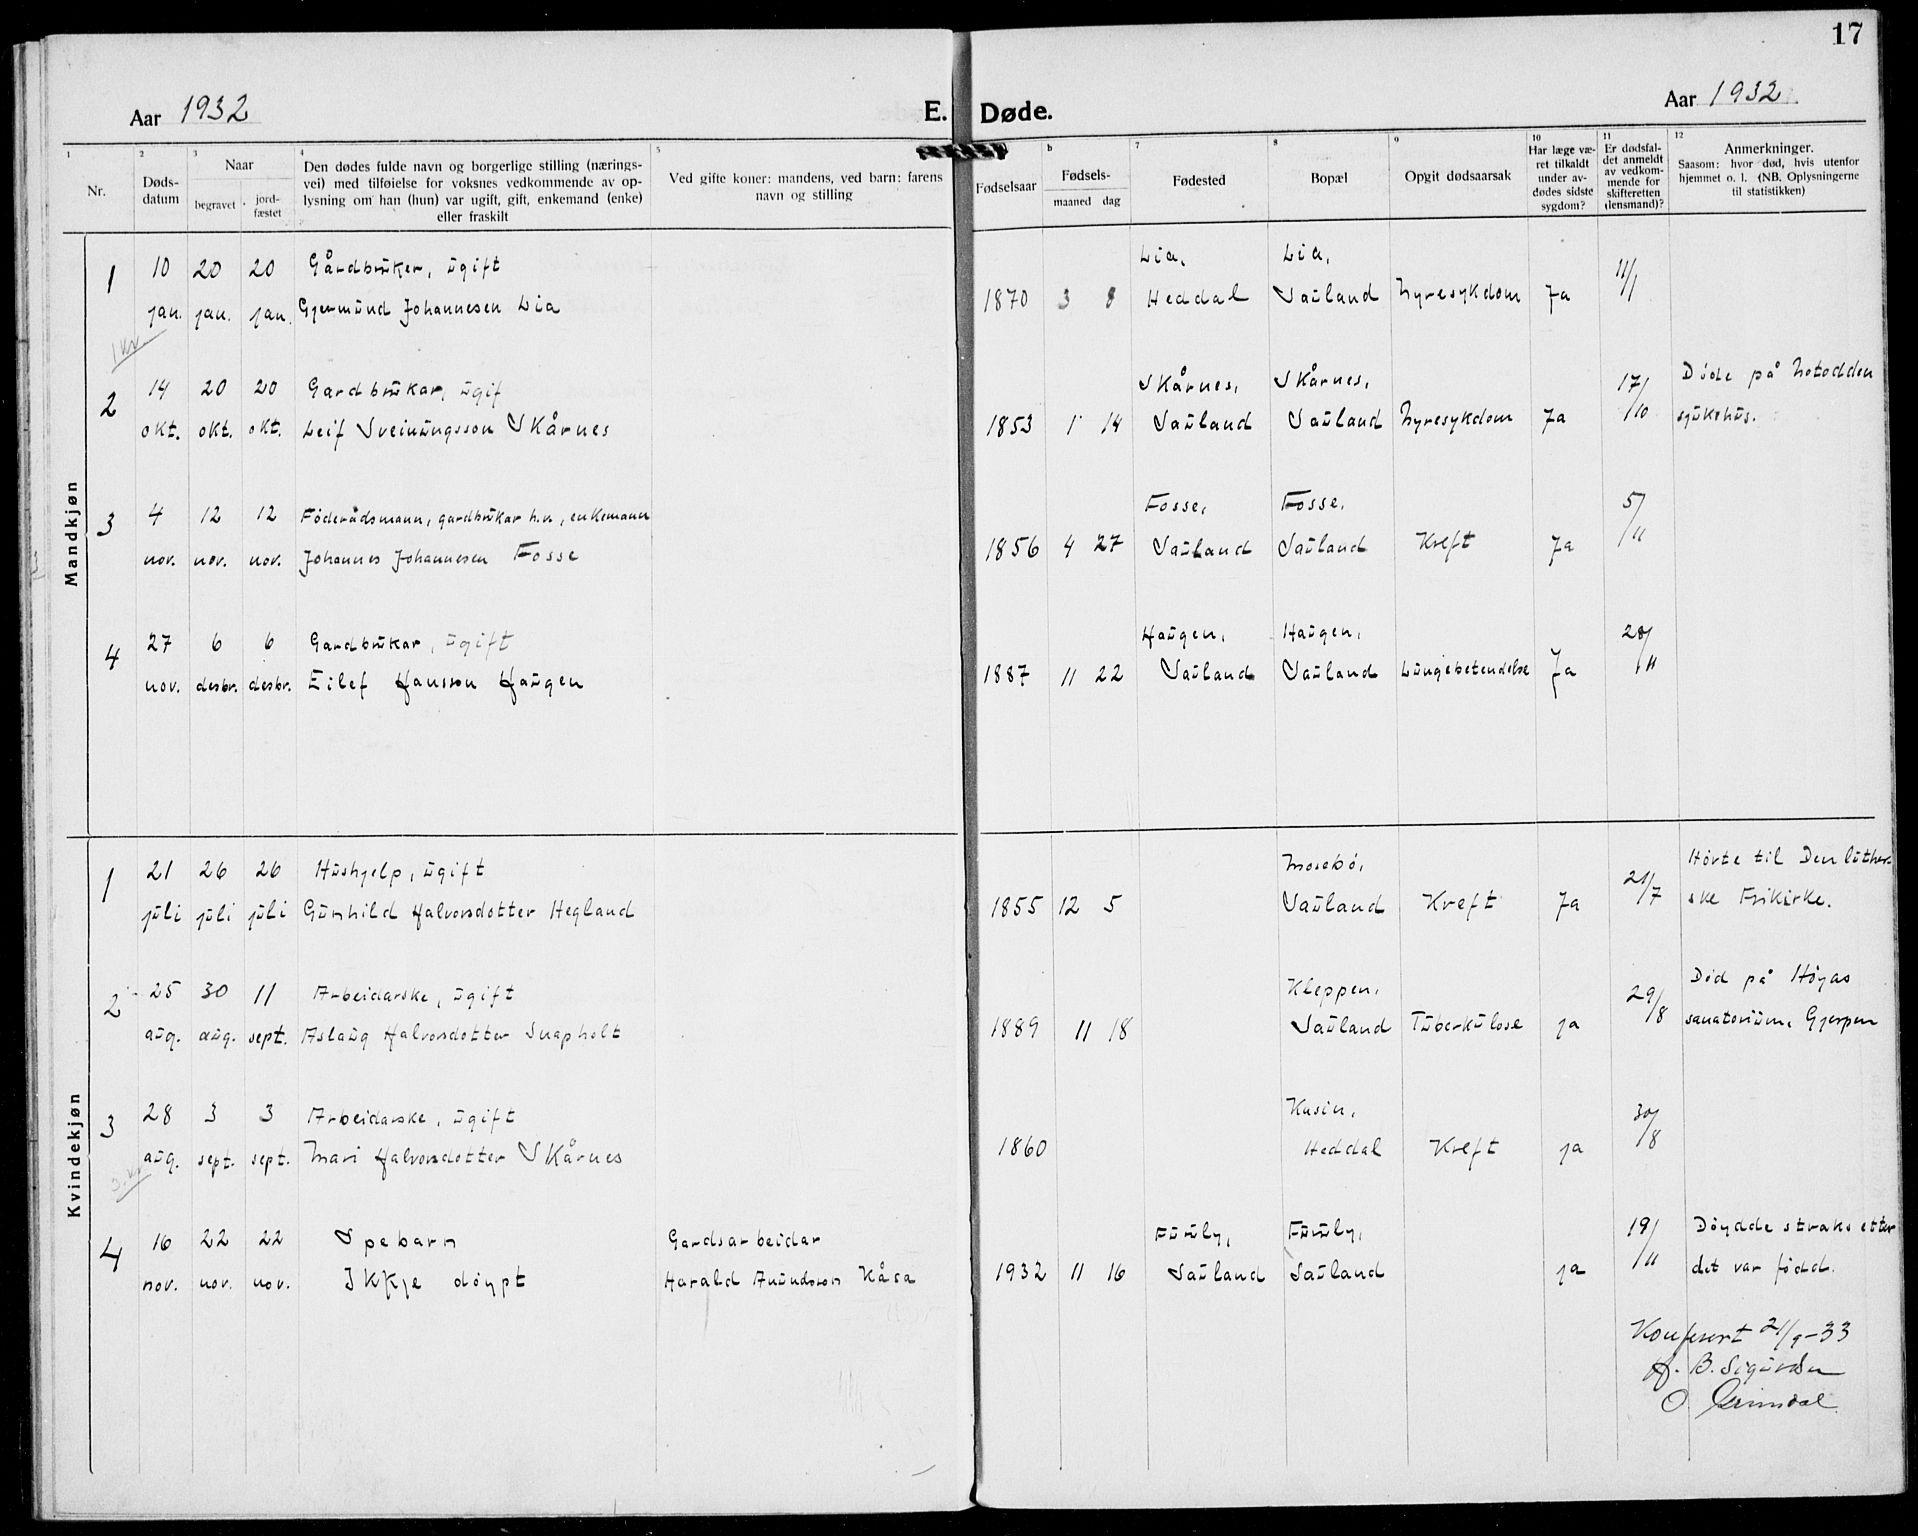 SAKO, Hjartdal kirkebøker, F/Fb/L0002: Ministerialbok nr. II 2, 1880-1932, s. 17